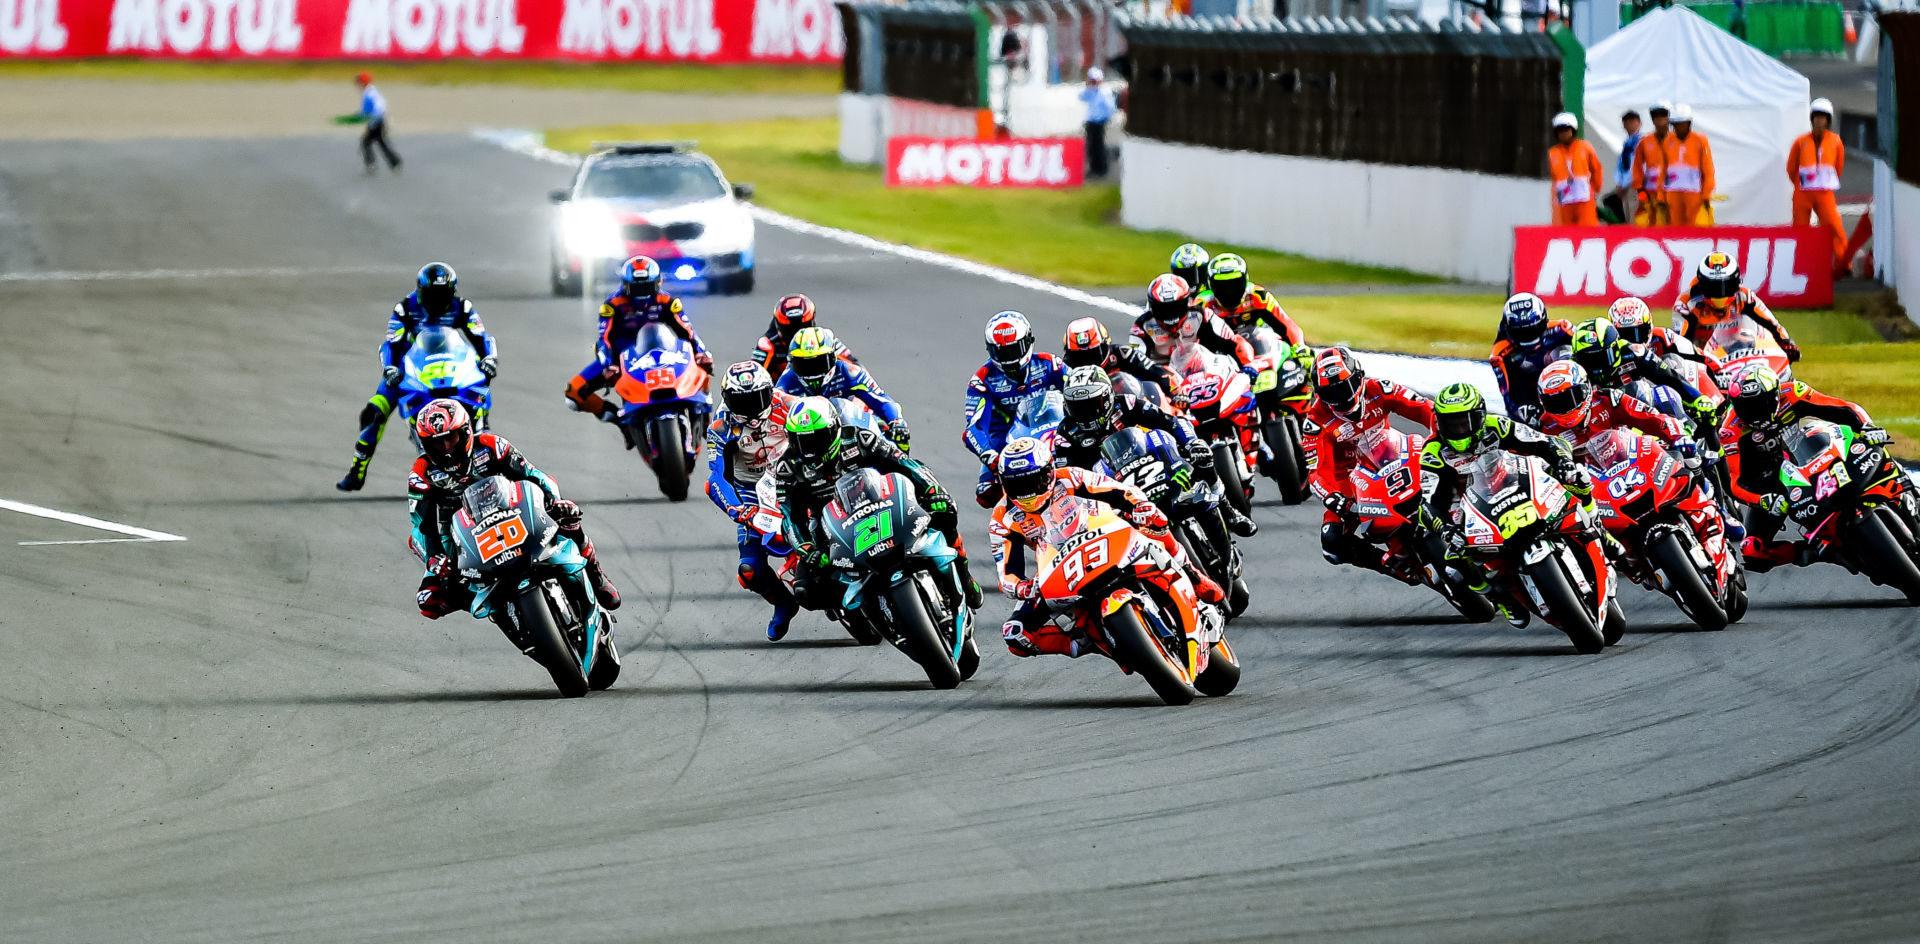 The start of the 2019 Japanese Grand Prix at Twin Ring Motegi. Photo by Kohei Hirota.